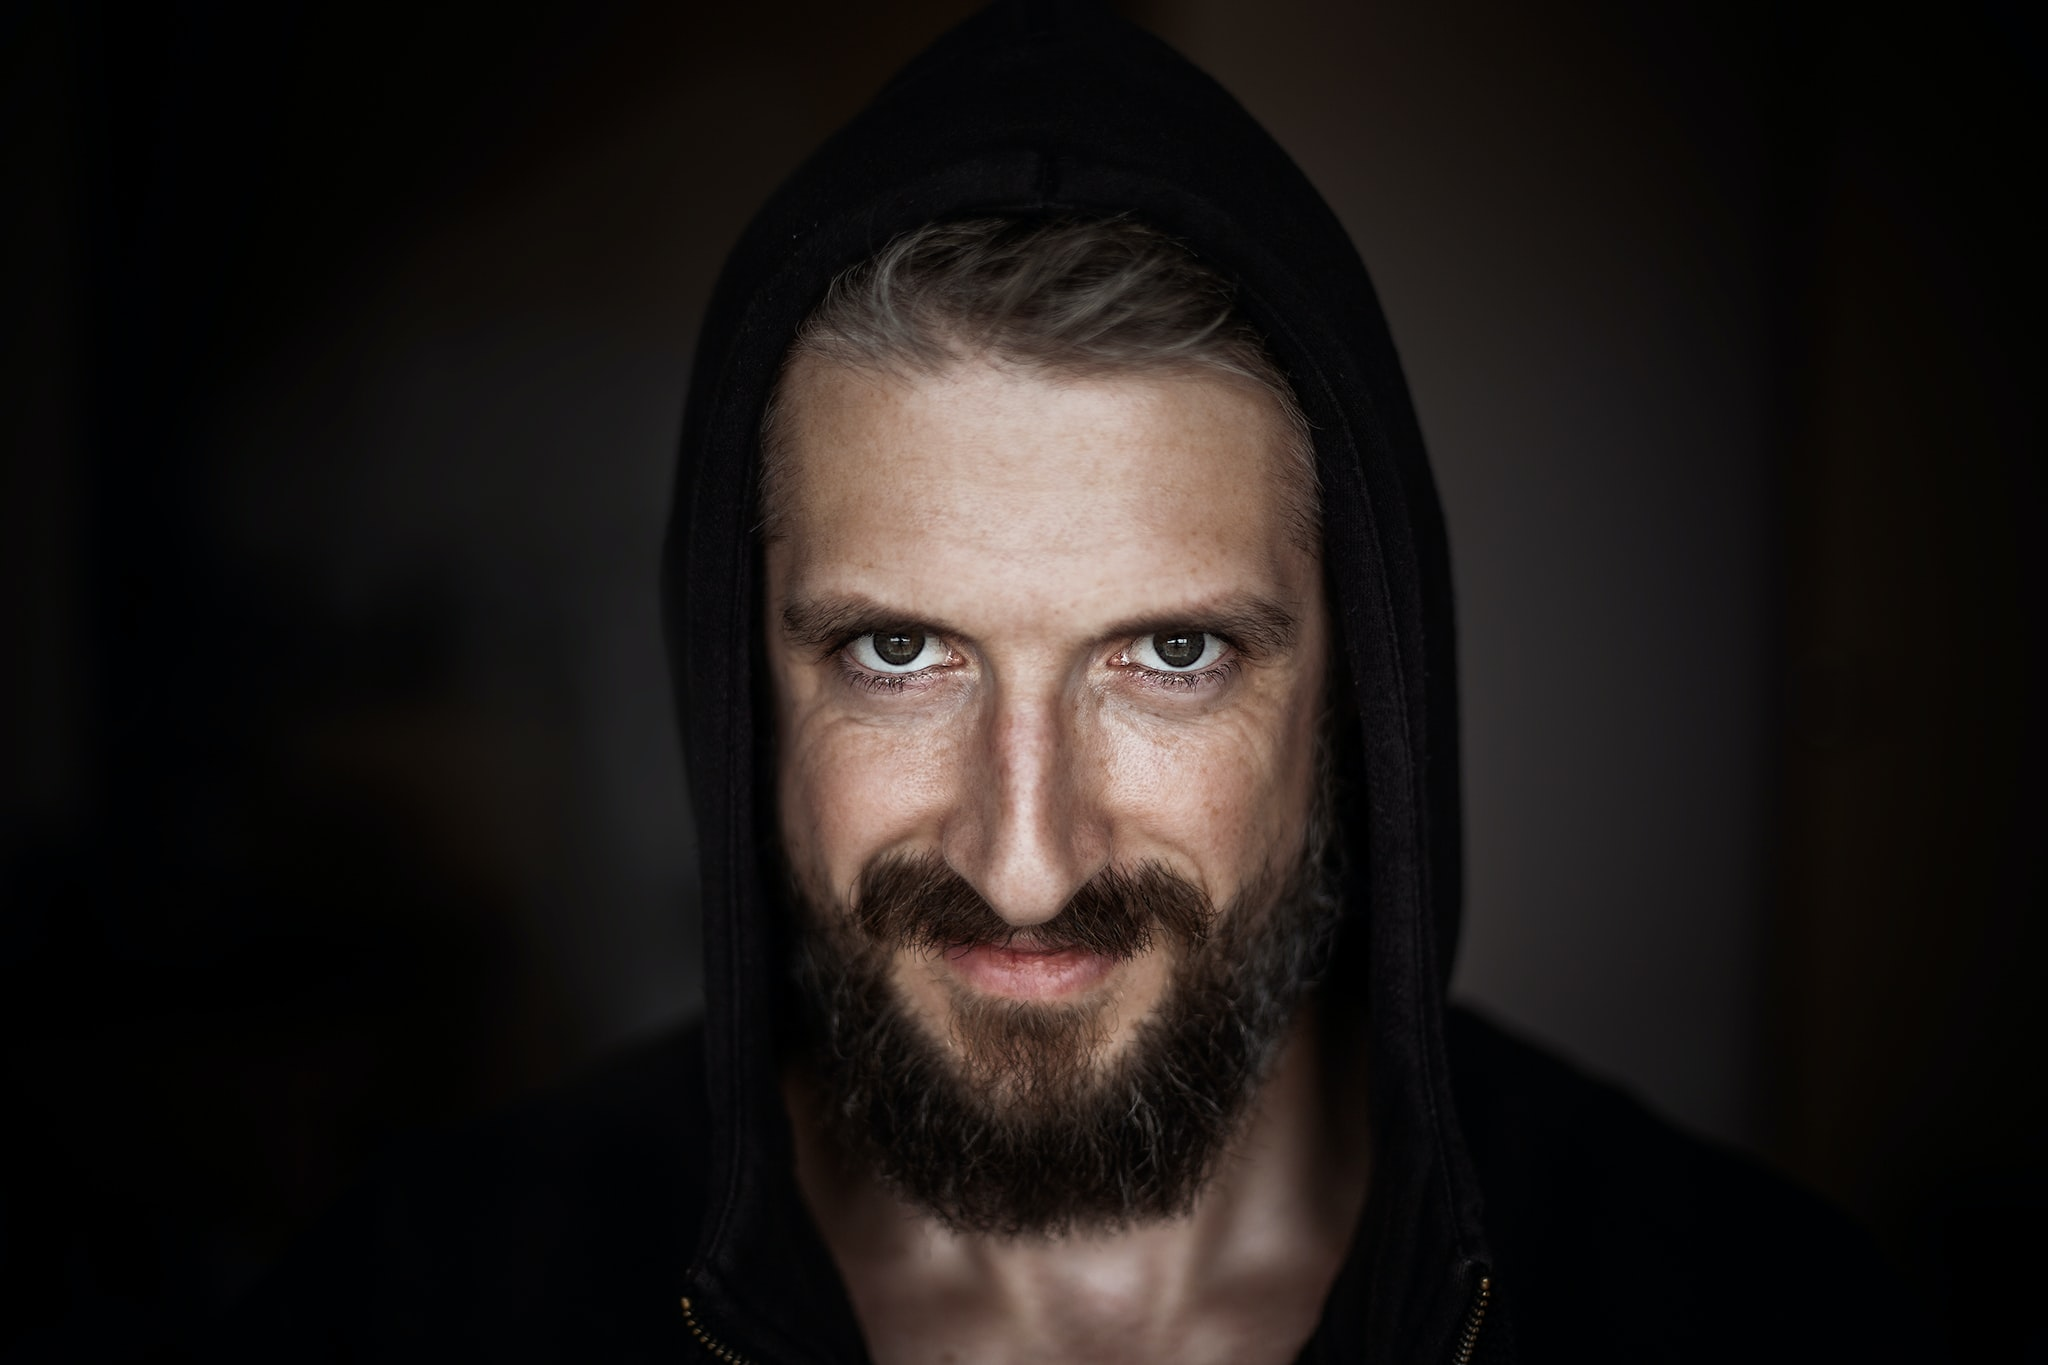 Go to Marek Szulc's profile